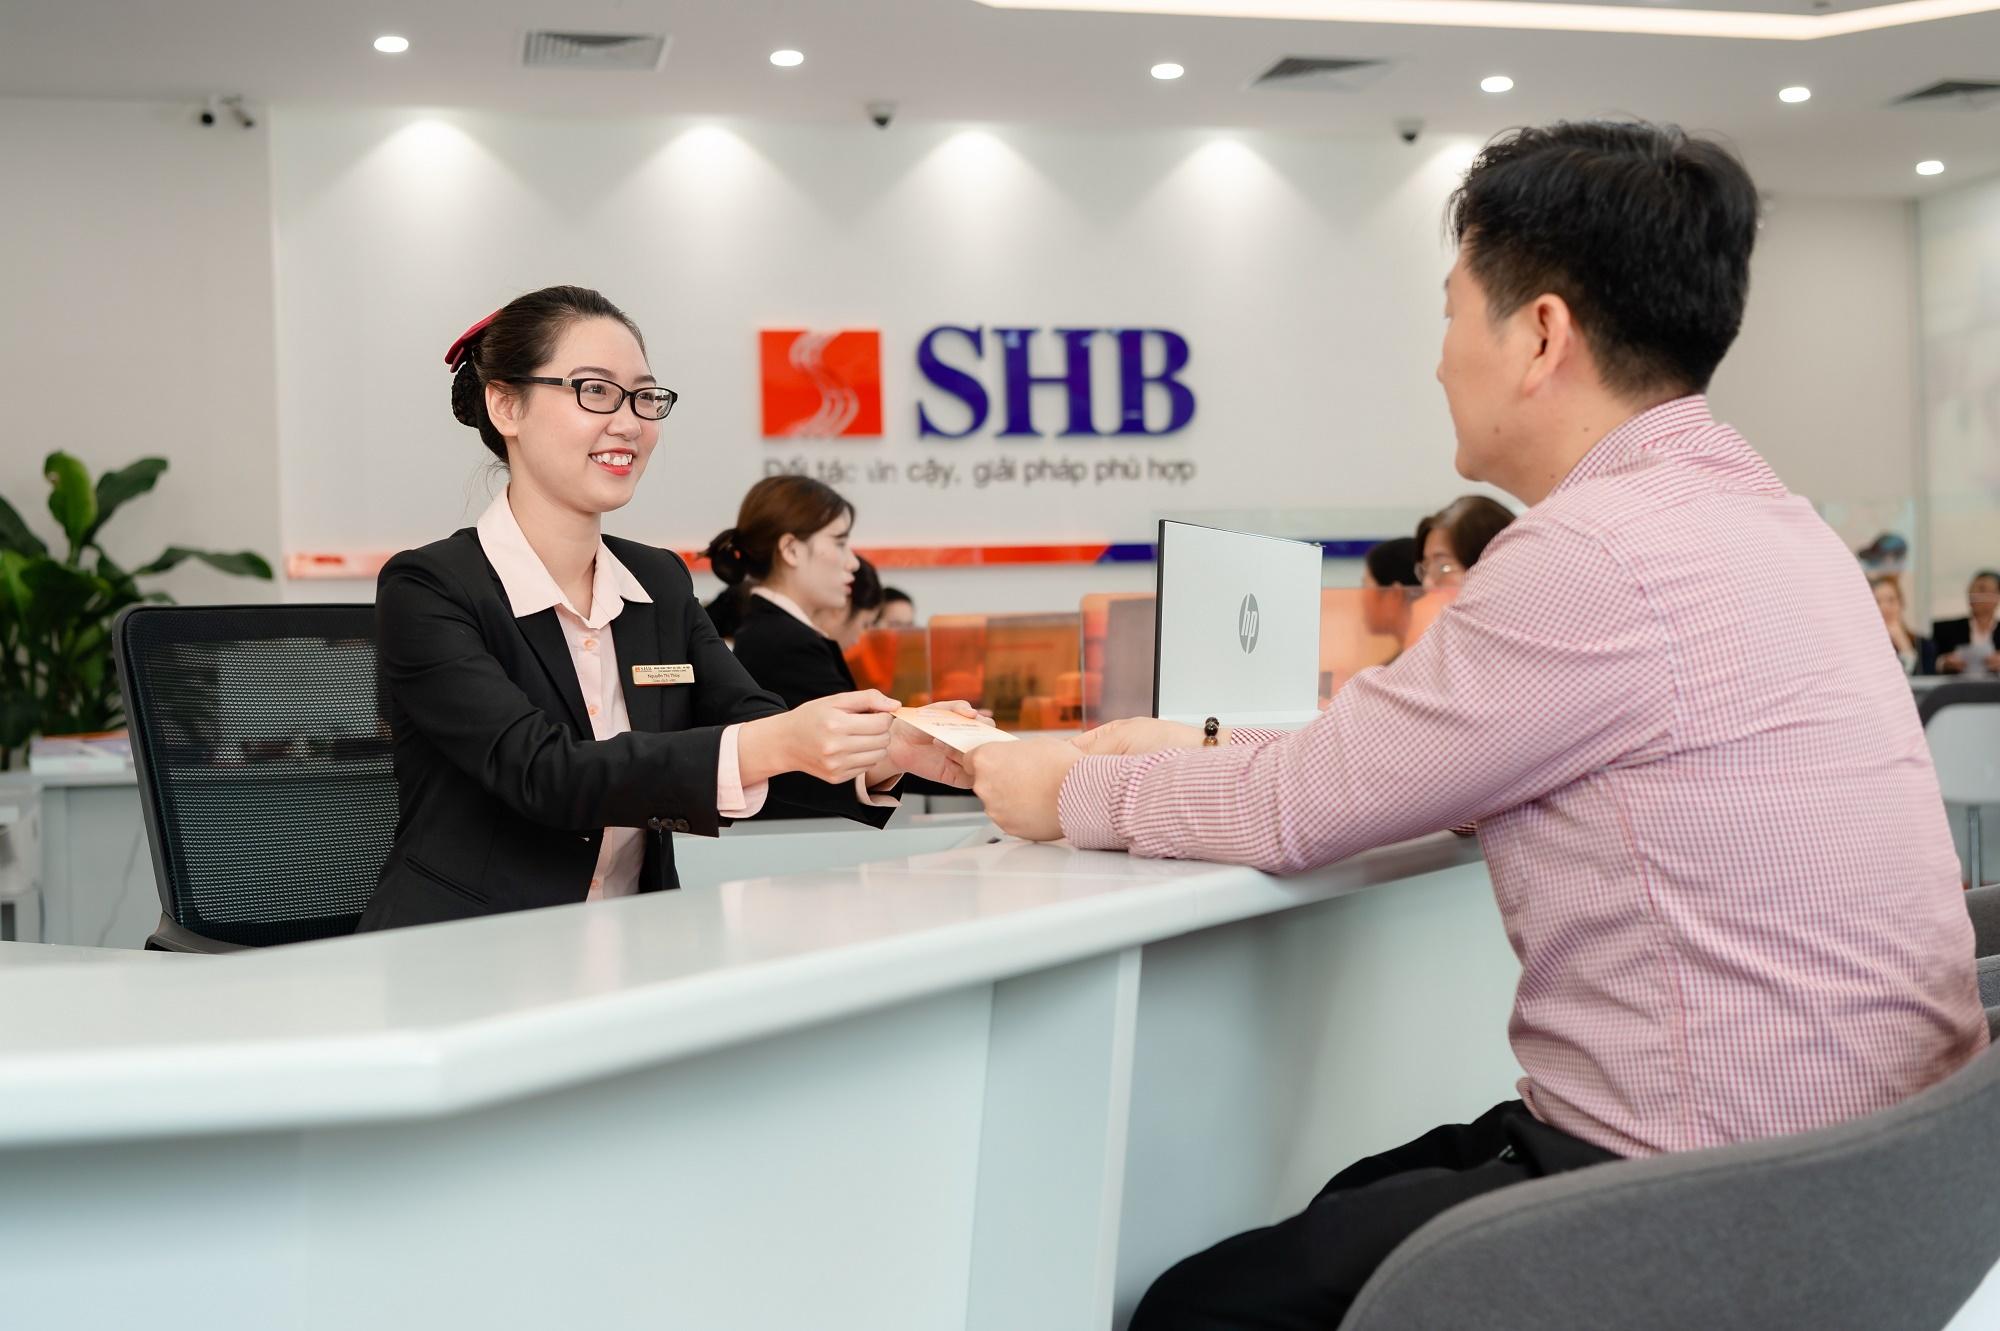 shb phat hanh chung chi tien gui lai suat len toi 93nam